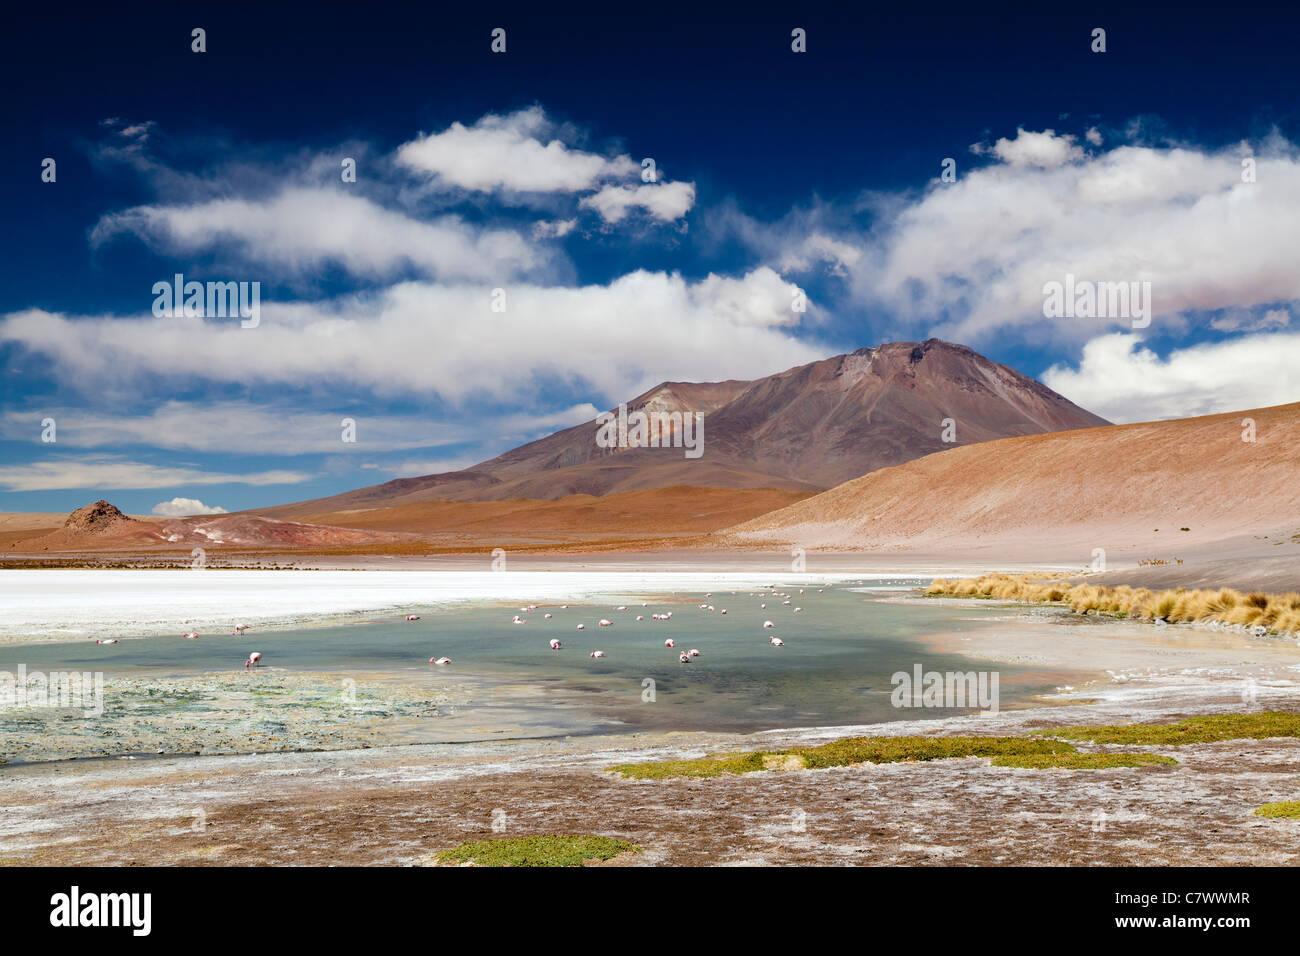 The stunning scenery of the Bolivian altiplano, between San Pedro de Quemez and Ojo de Perdiz - Stock Image